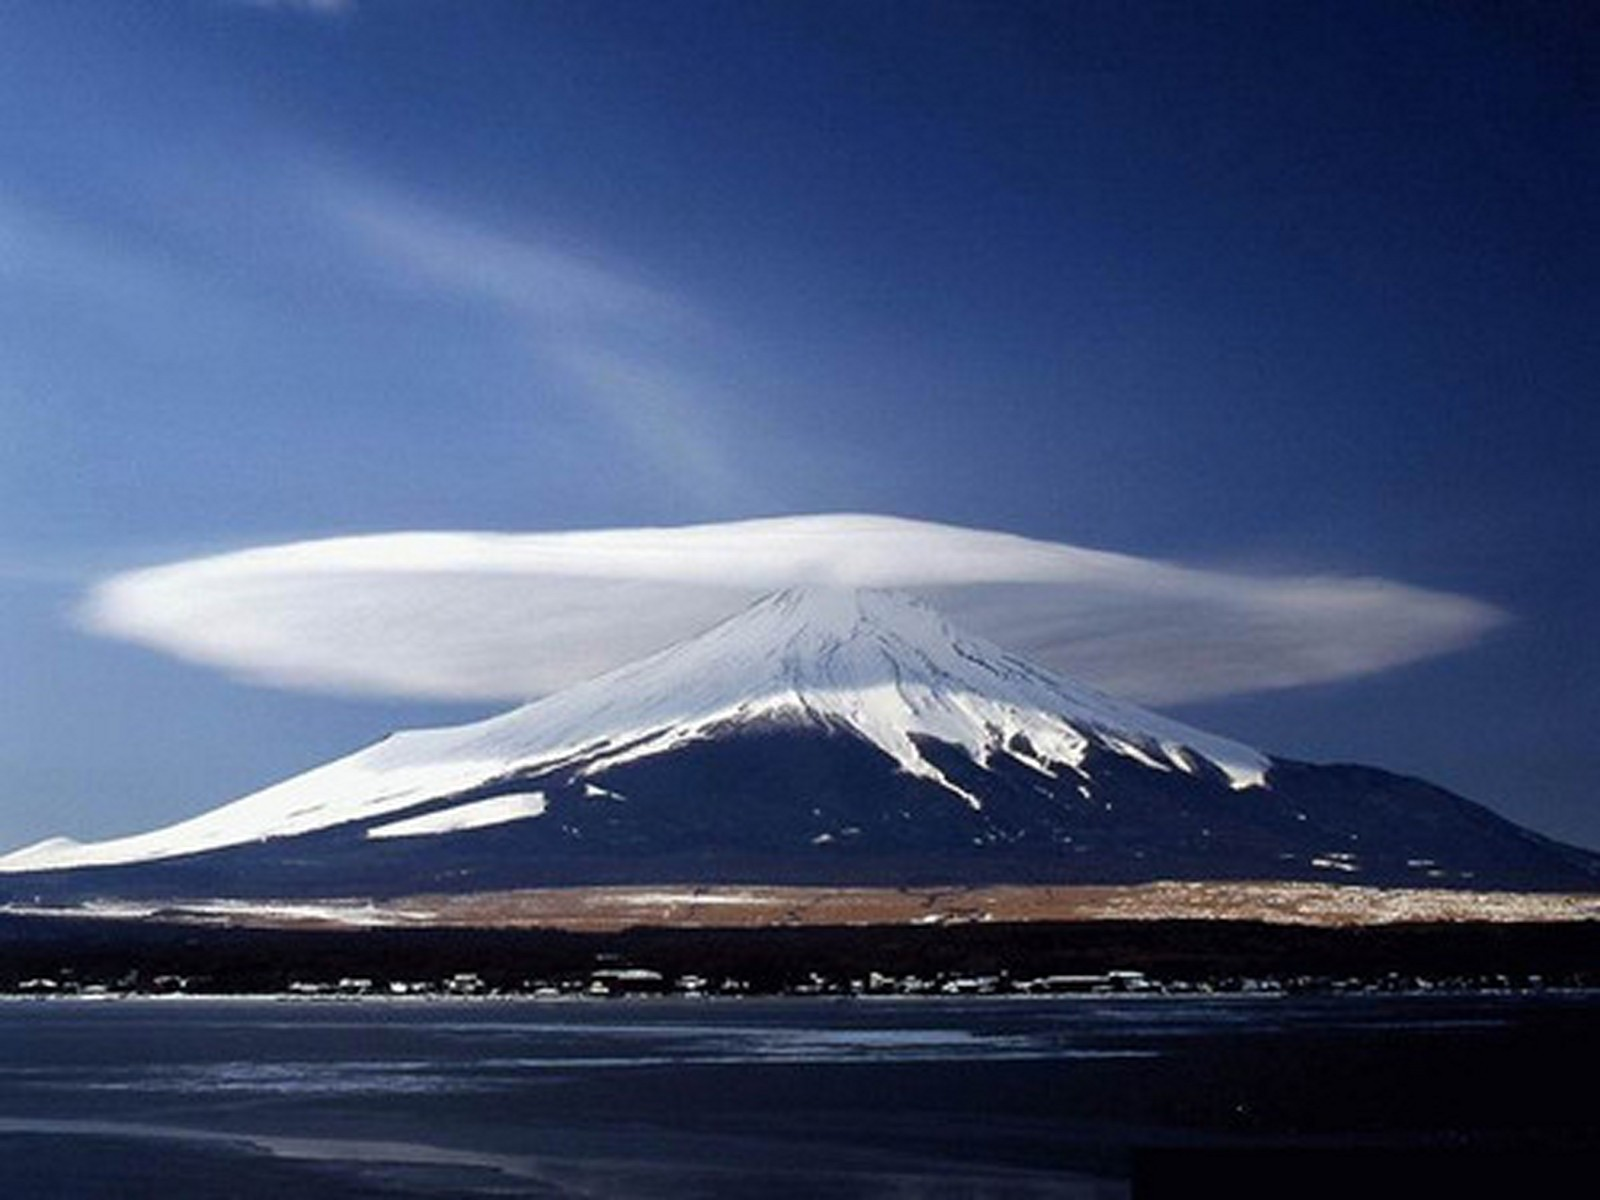 marvelous_lenticular_clouds